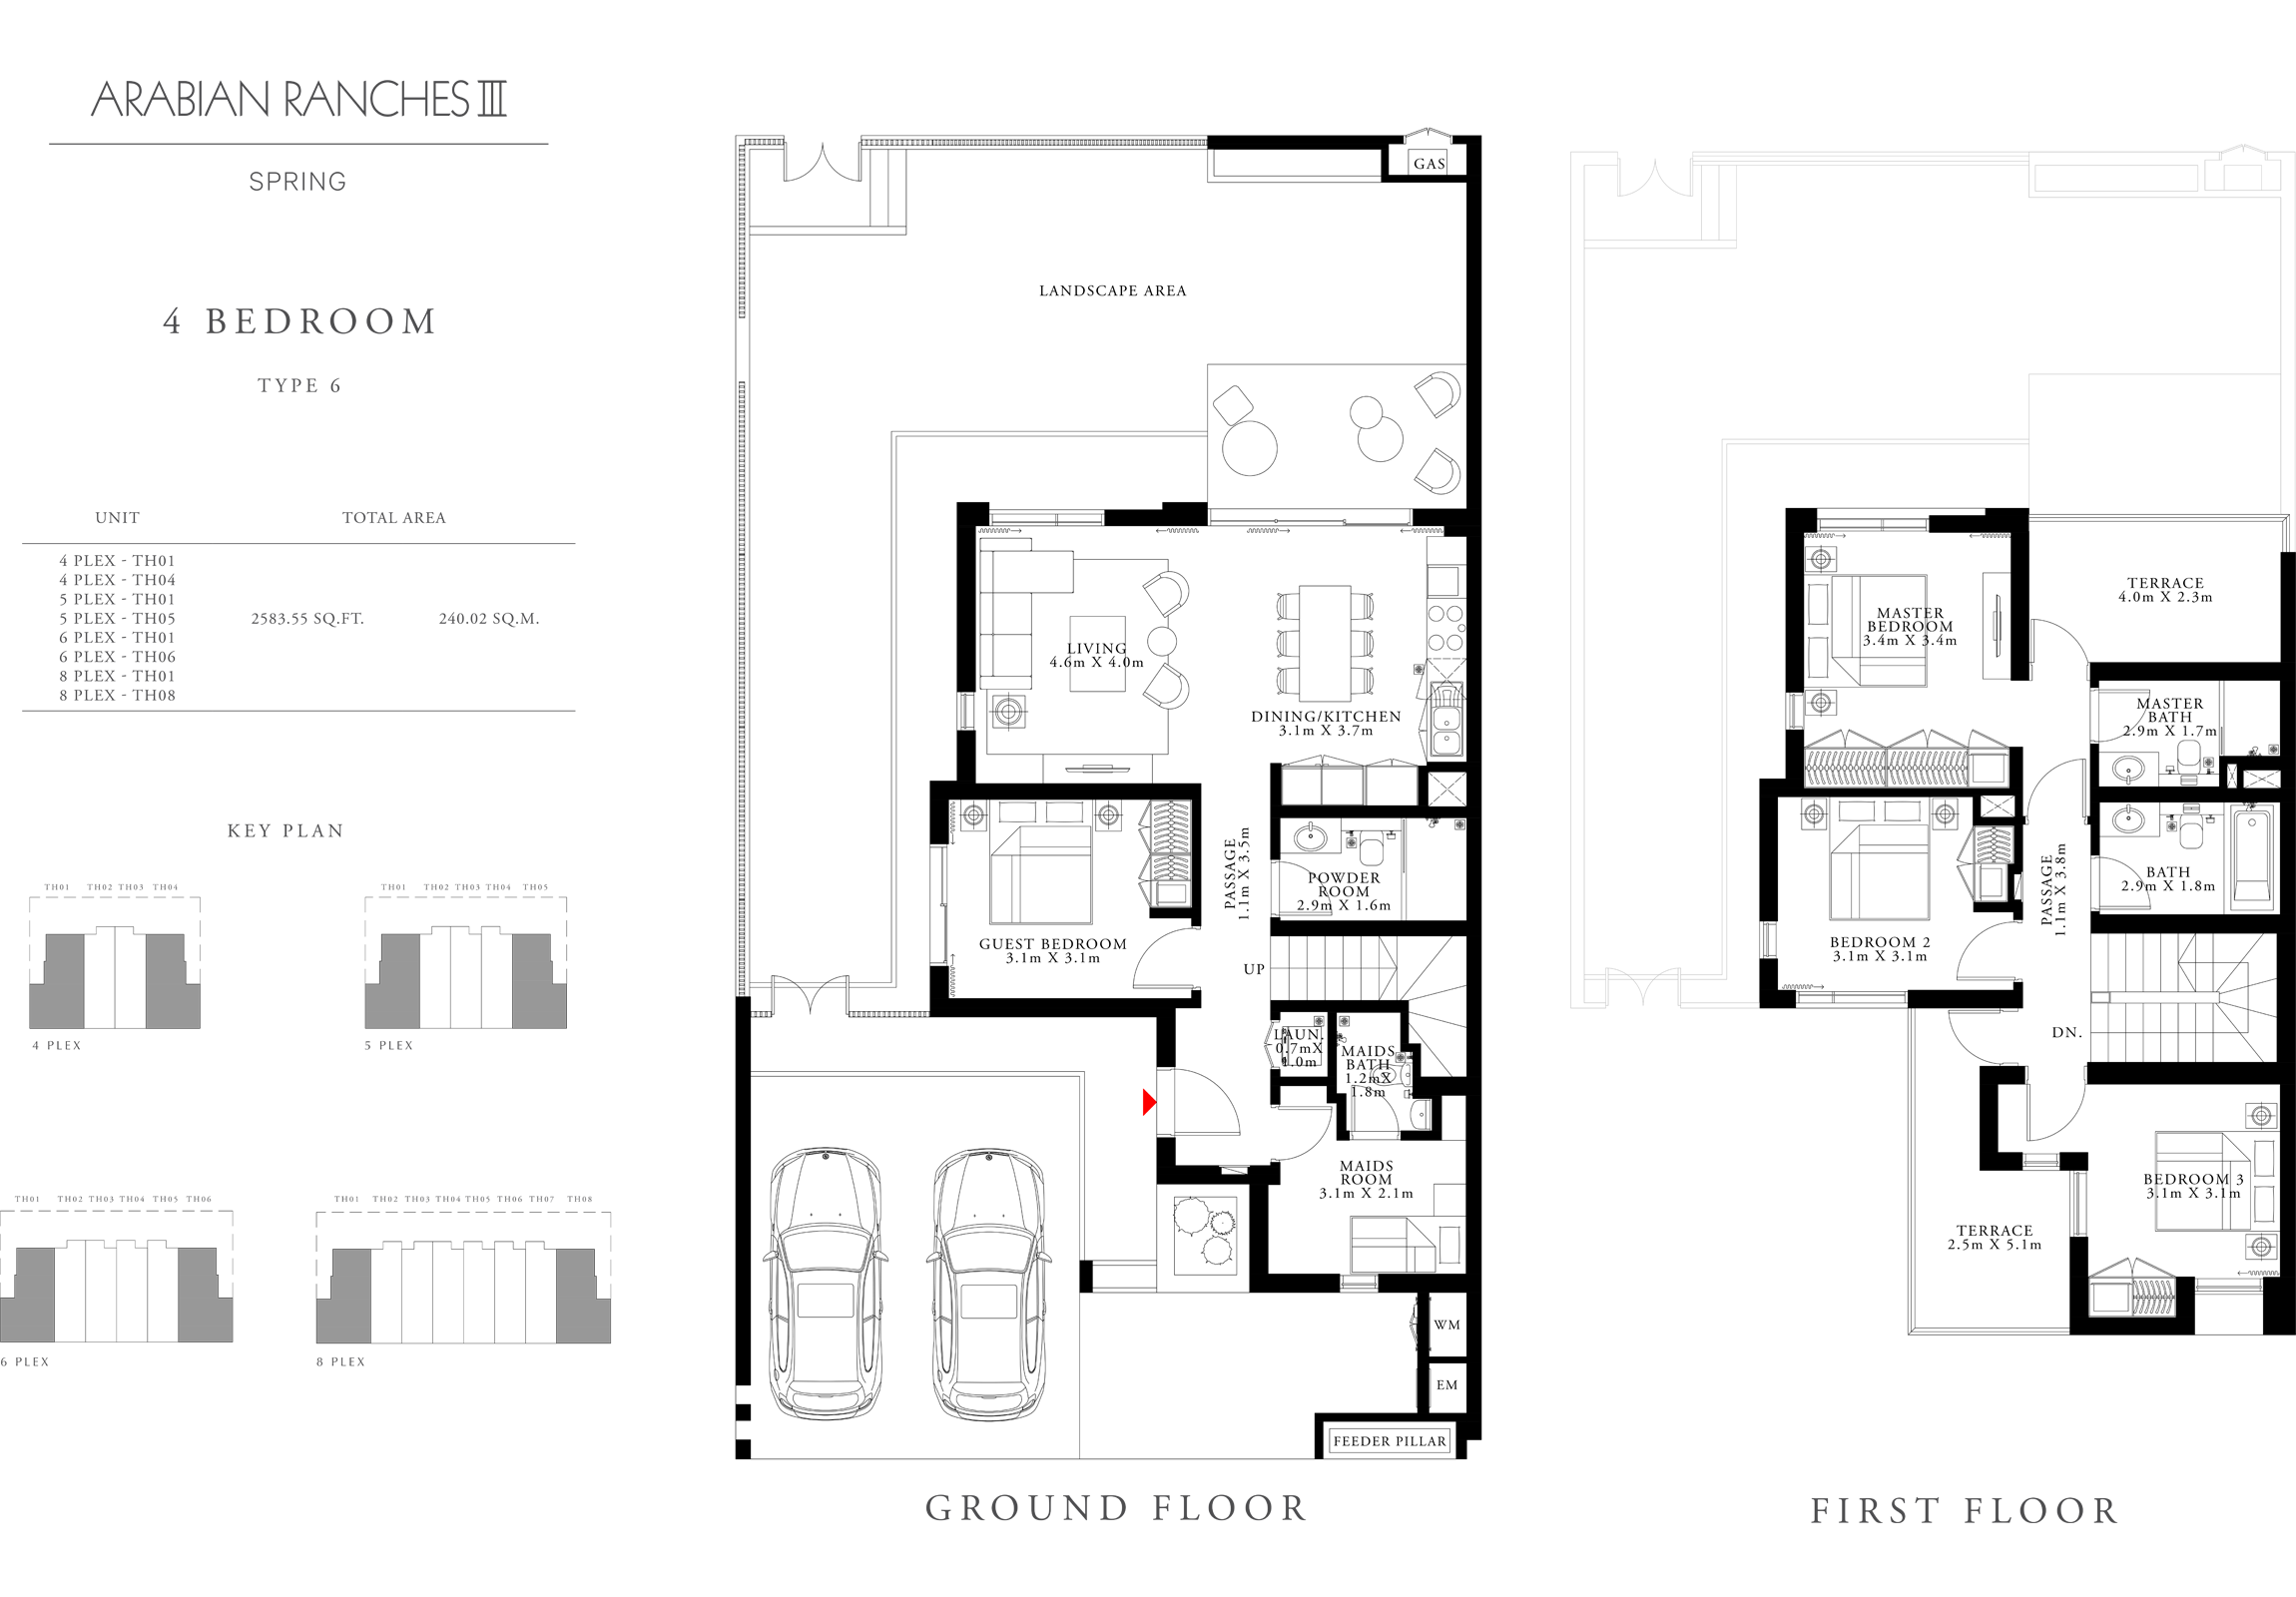 4 غرف نوم، نوع 6، حجم 2583.55 قدم مربع